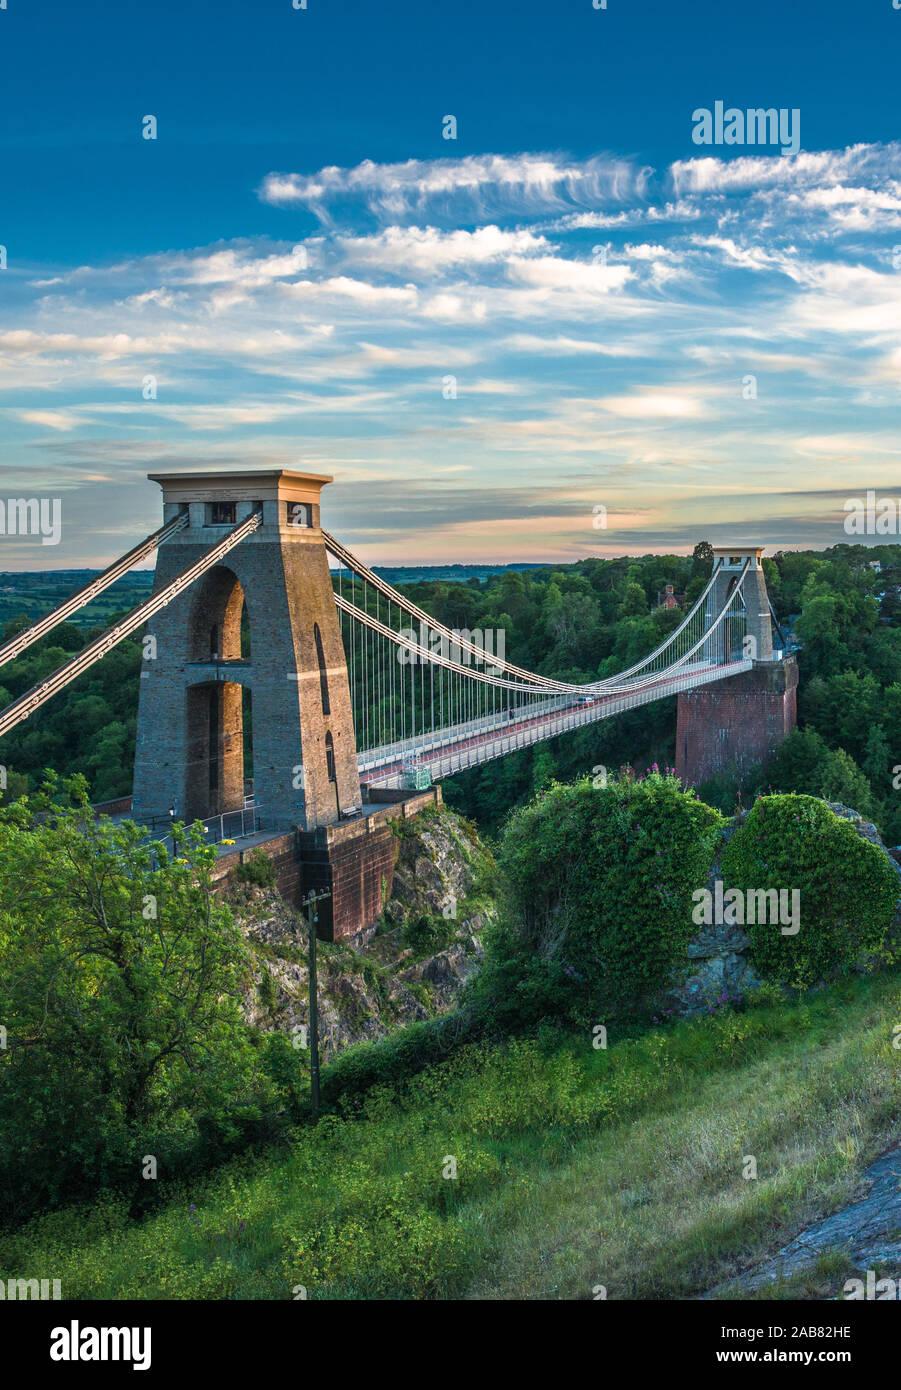 Historic Clifton Suspension Bridge by Isambard Kingdom Brunel spans the Avon Gorge with River Avon below, Bristol, England, United Kingdom, Europe Stock Photo